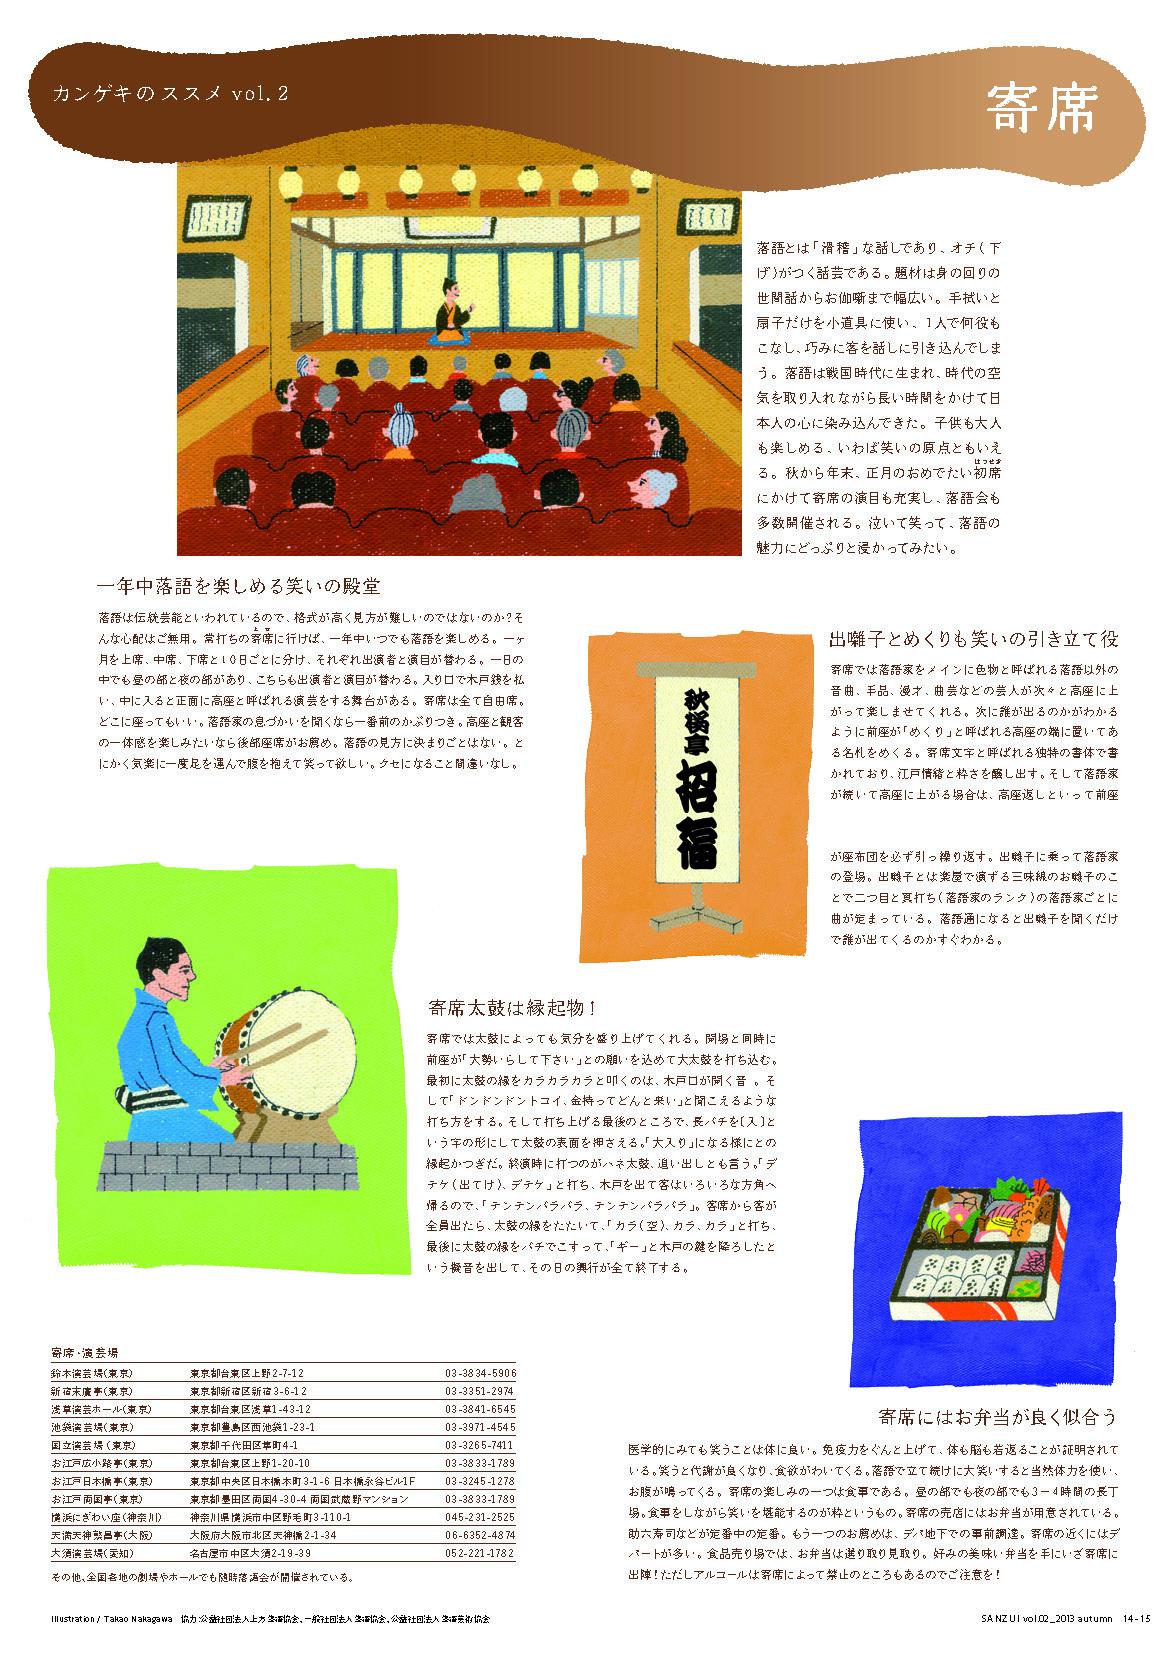 sanzui02_07.jpg